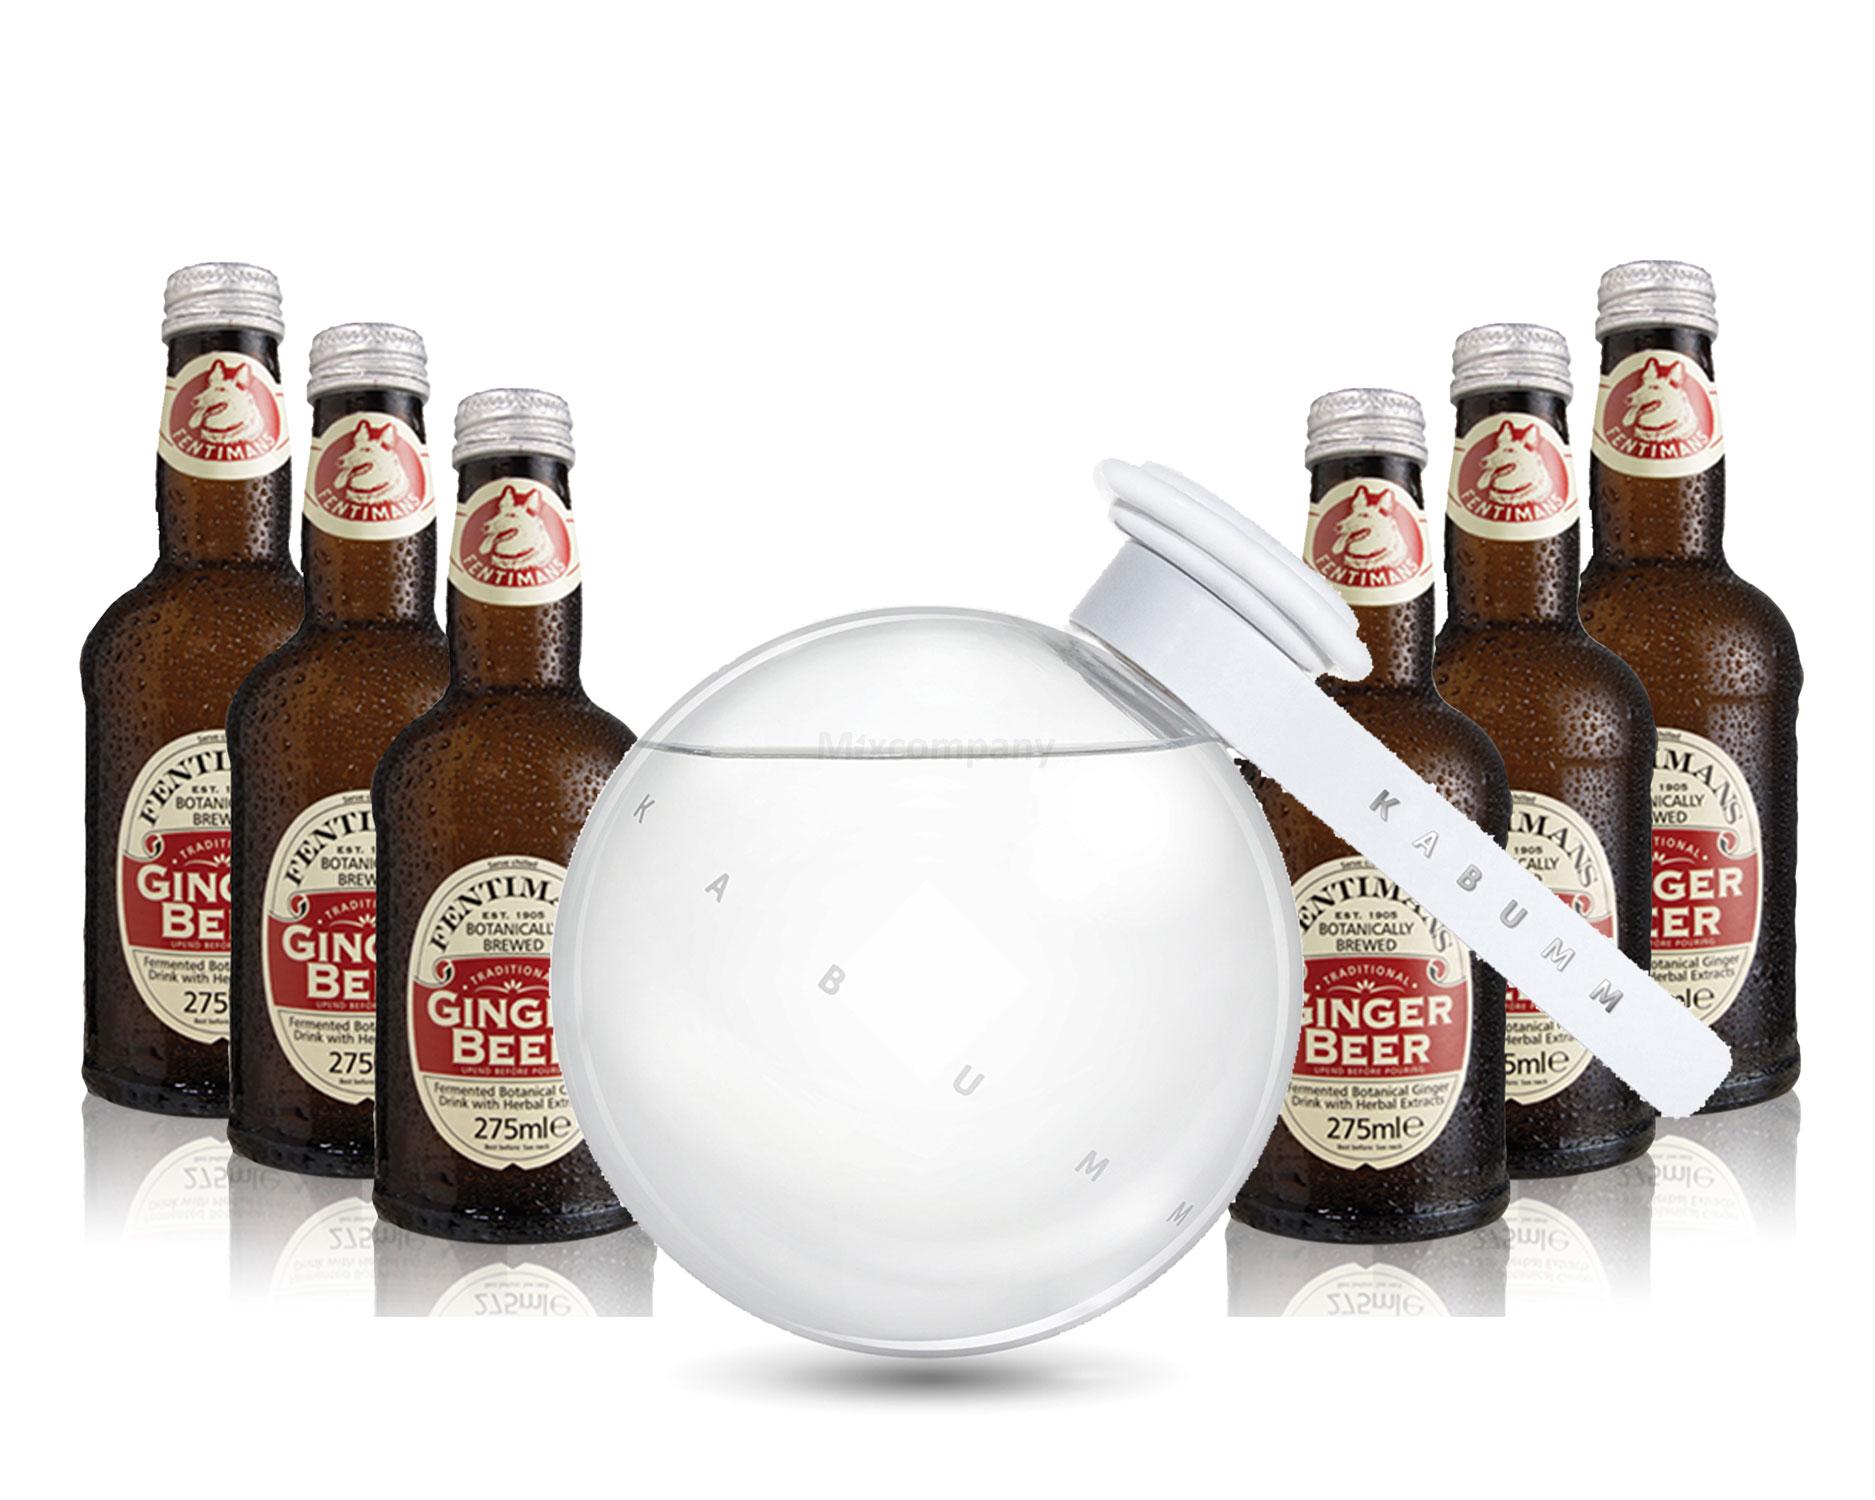 Moscow Mule Set - Kabumm Vodka 0,7l 700ml (40% Vol) + 6x Fentimans Traditional Ginger Beer 200ml - Inkl. Pfand MEHRWEG